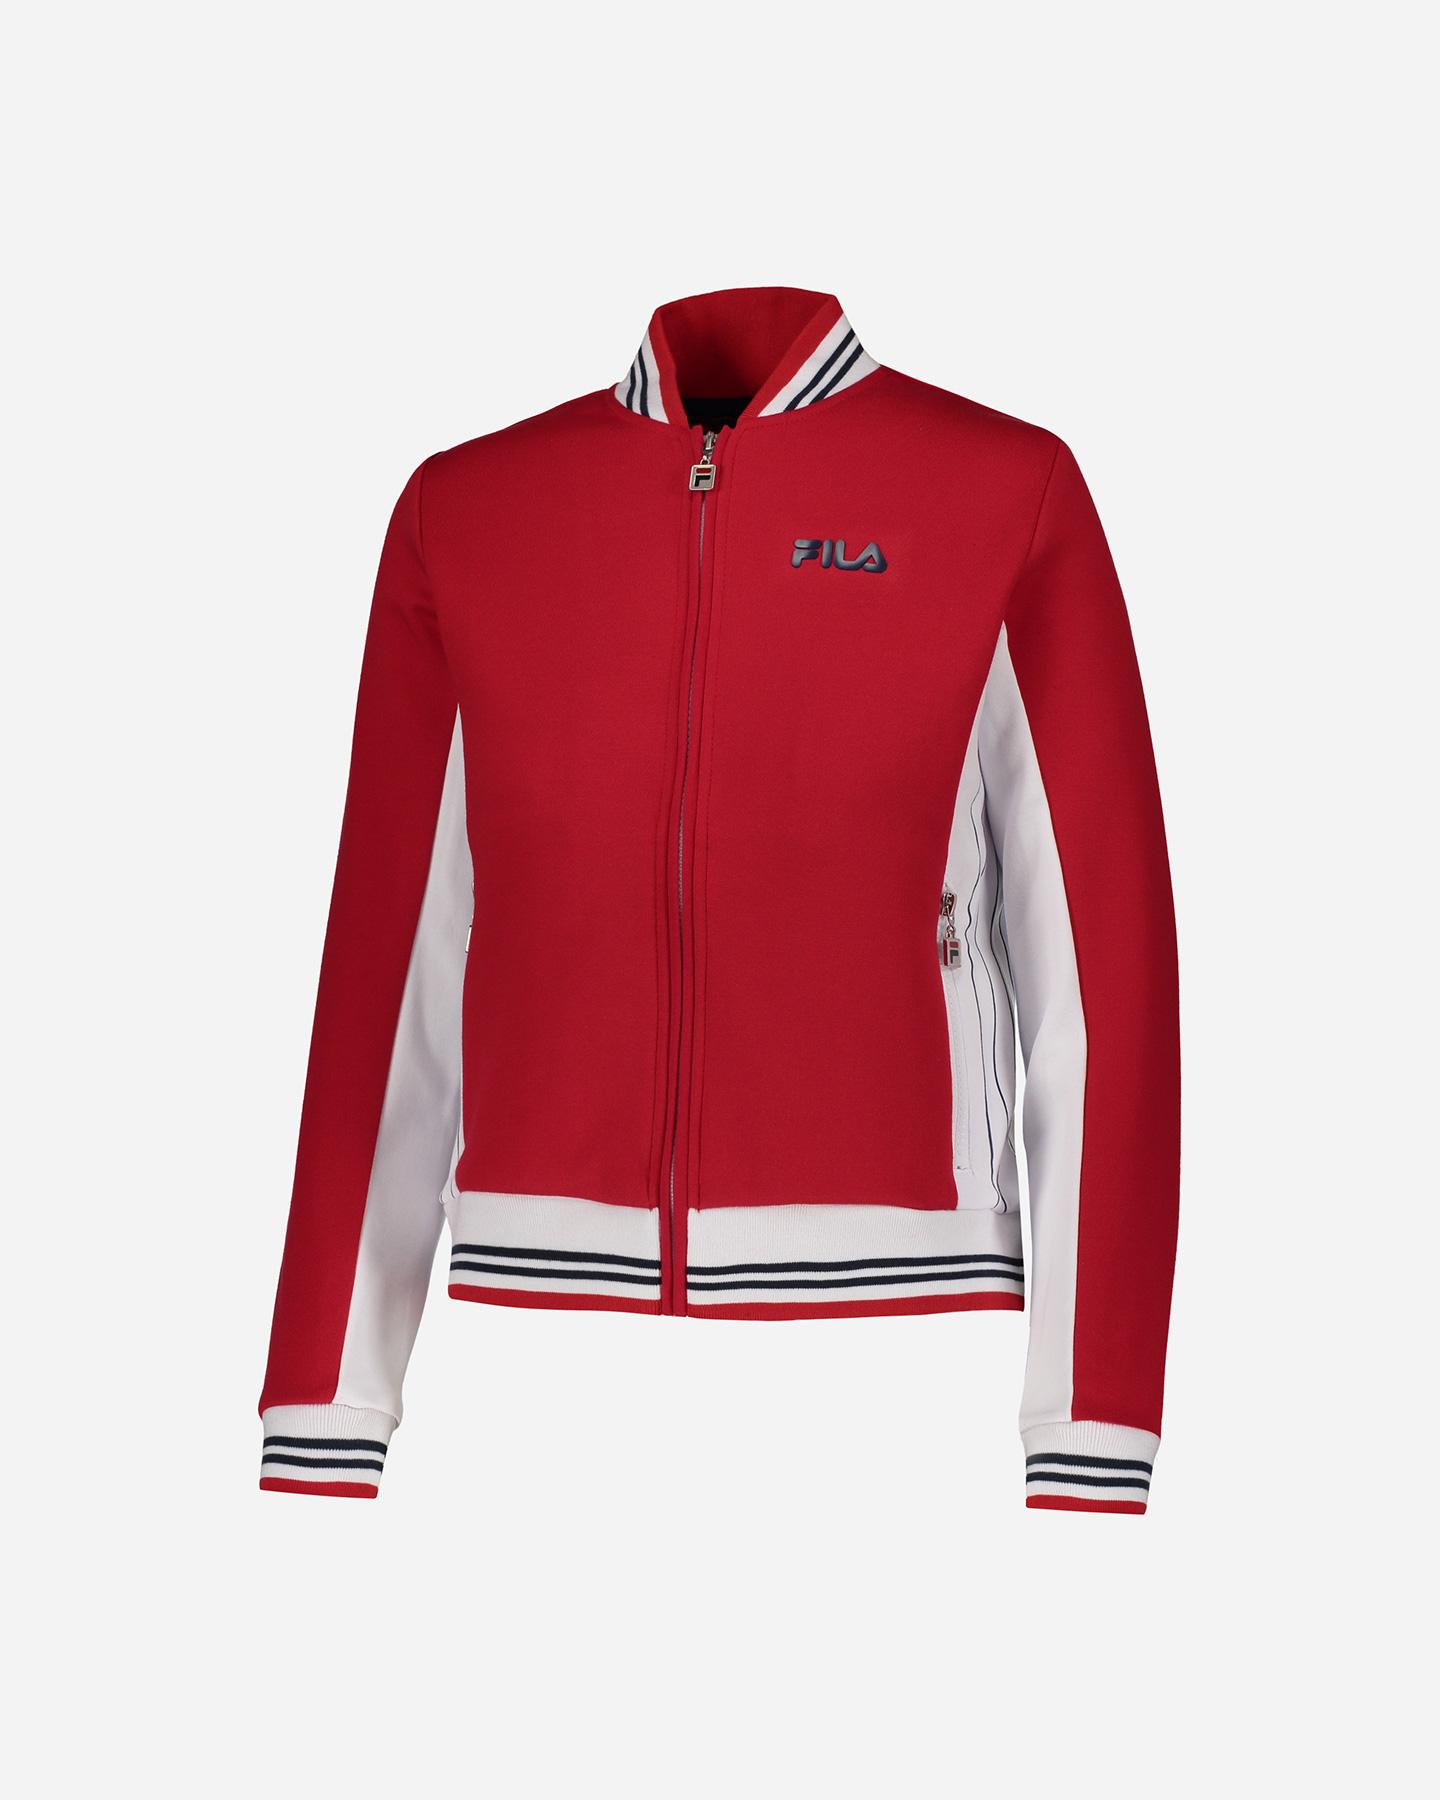 Asino Guinness Umido  Felpa Fila Fz Short Sweatshirt W FW250S18-270 | Cisalfa Sport